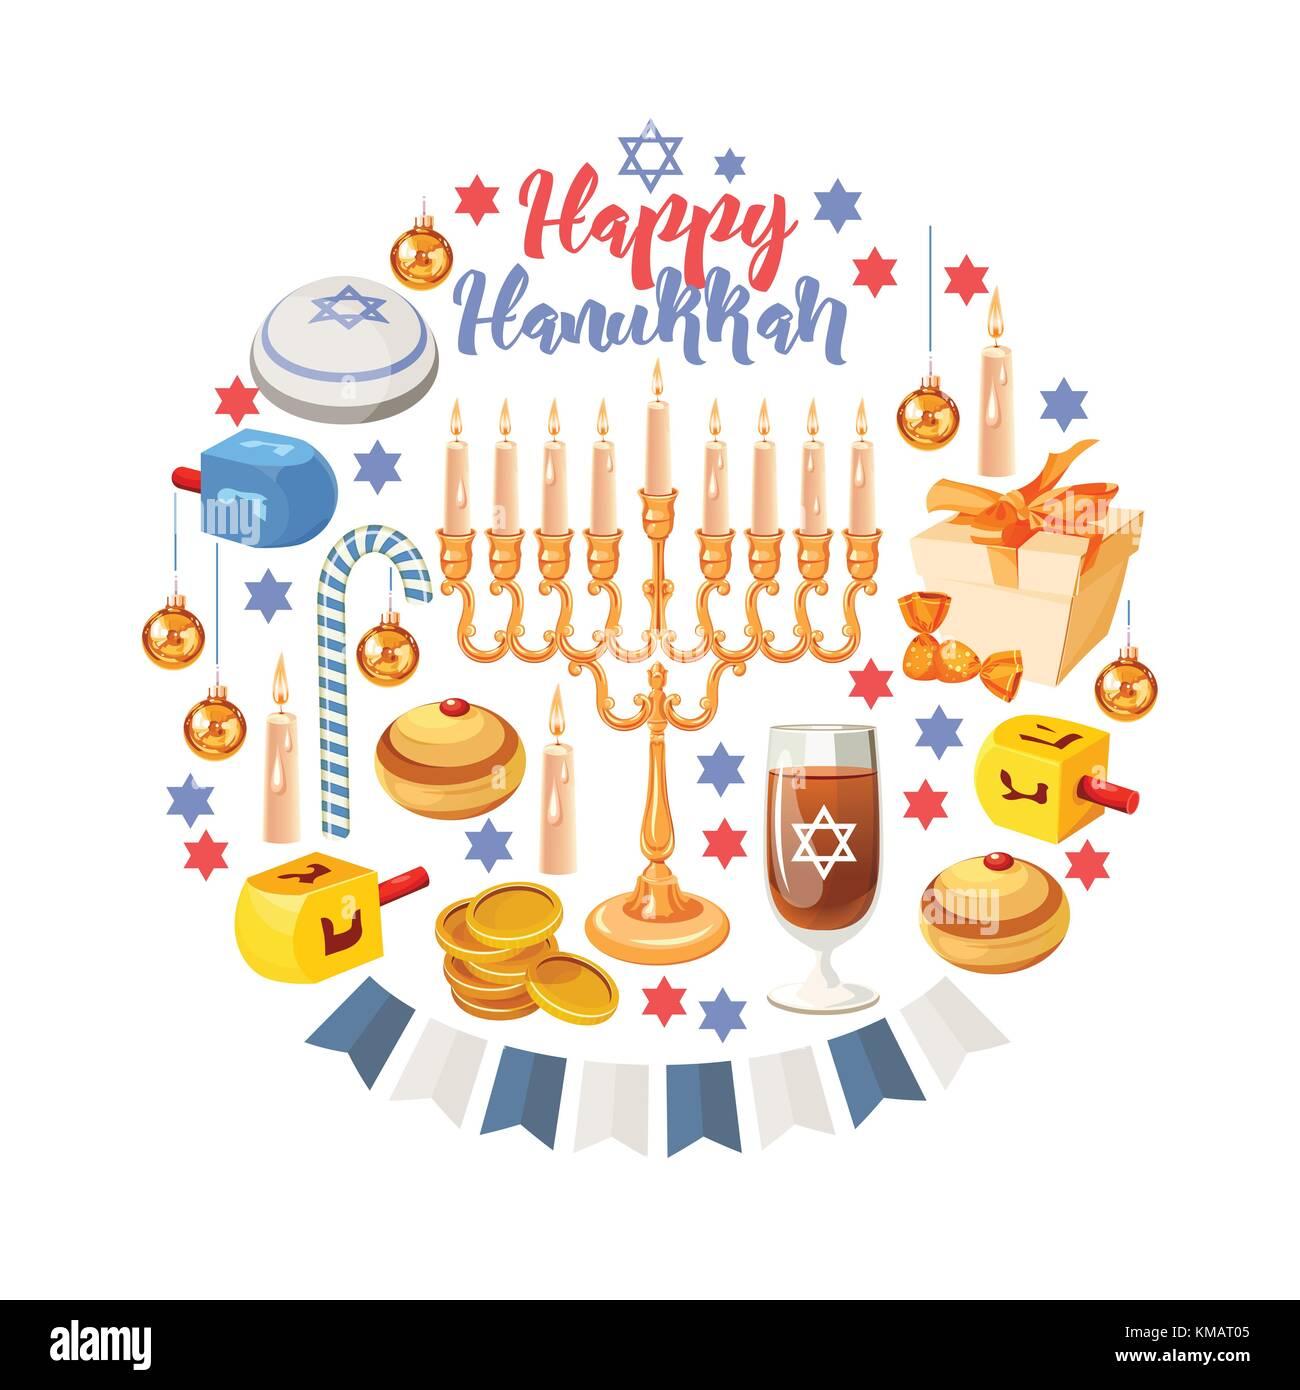 Happy Hanukkah vector greeting card in modern style - Stock Image